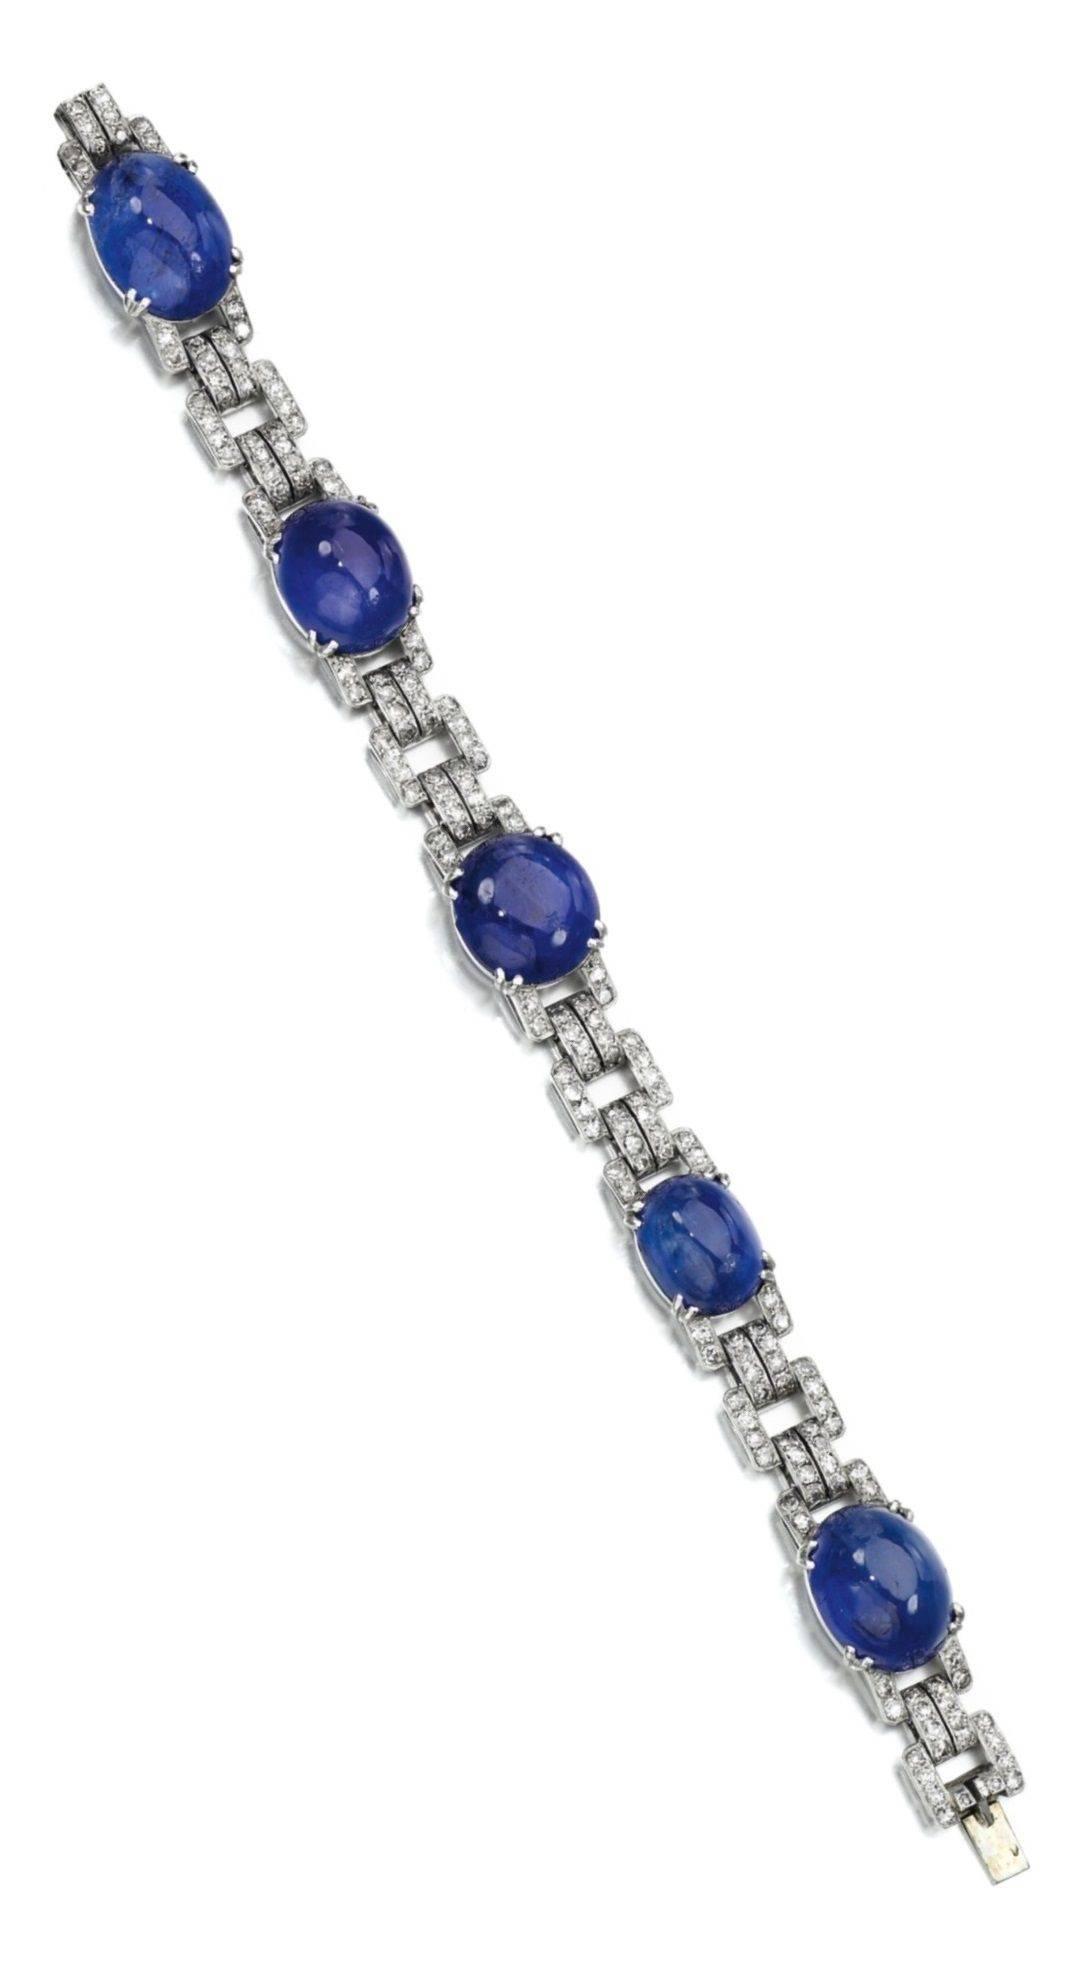 Art deco jewelry-15058979989473113